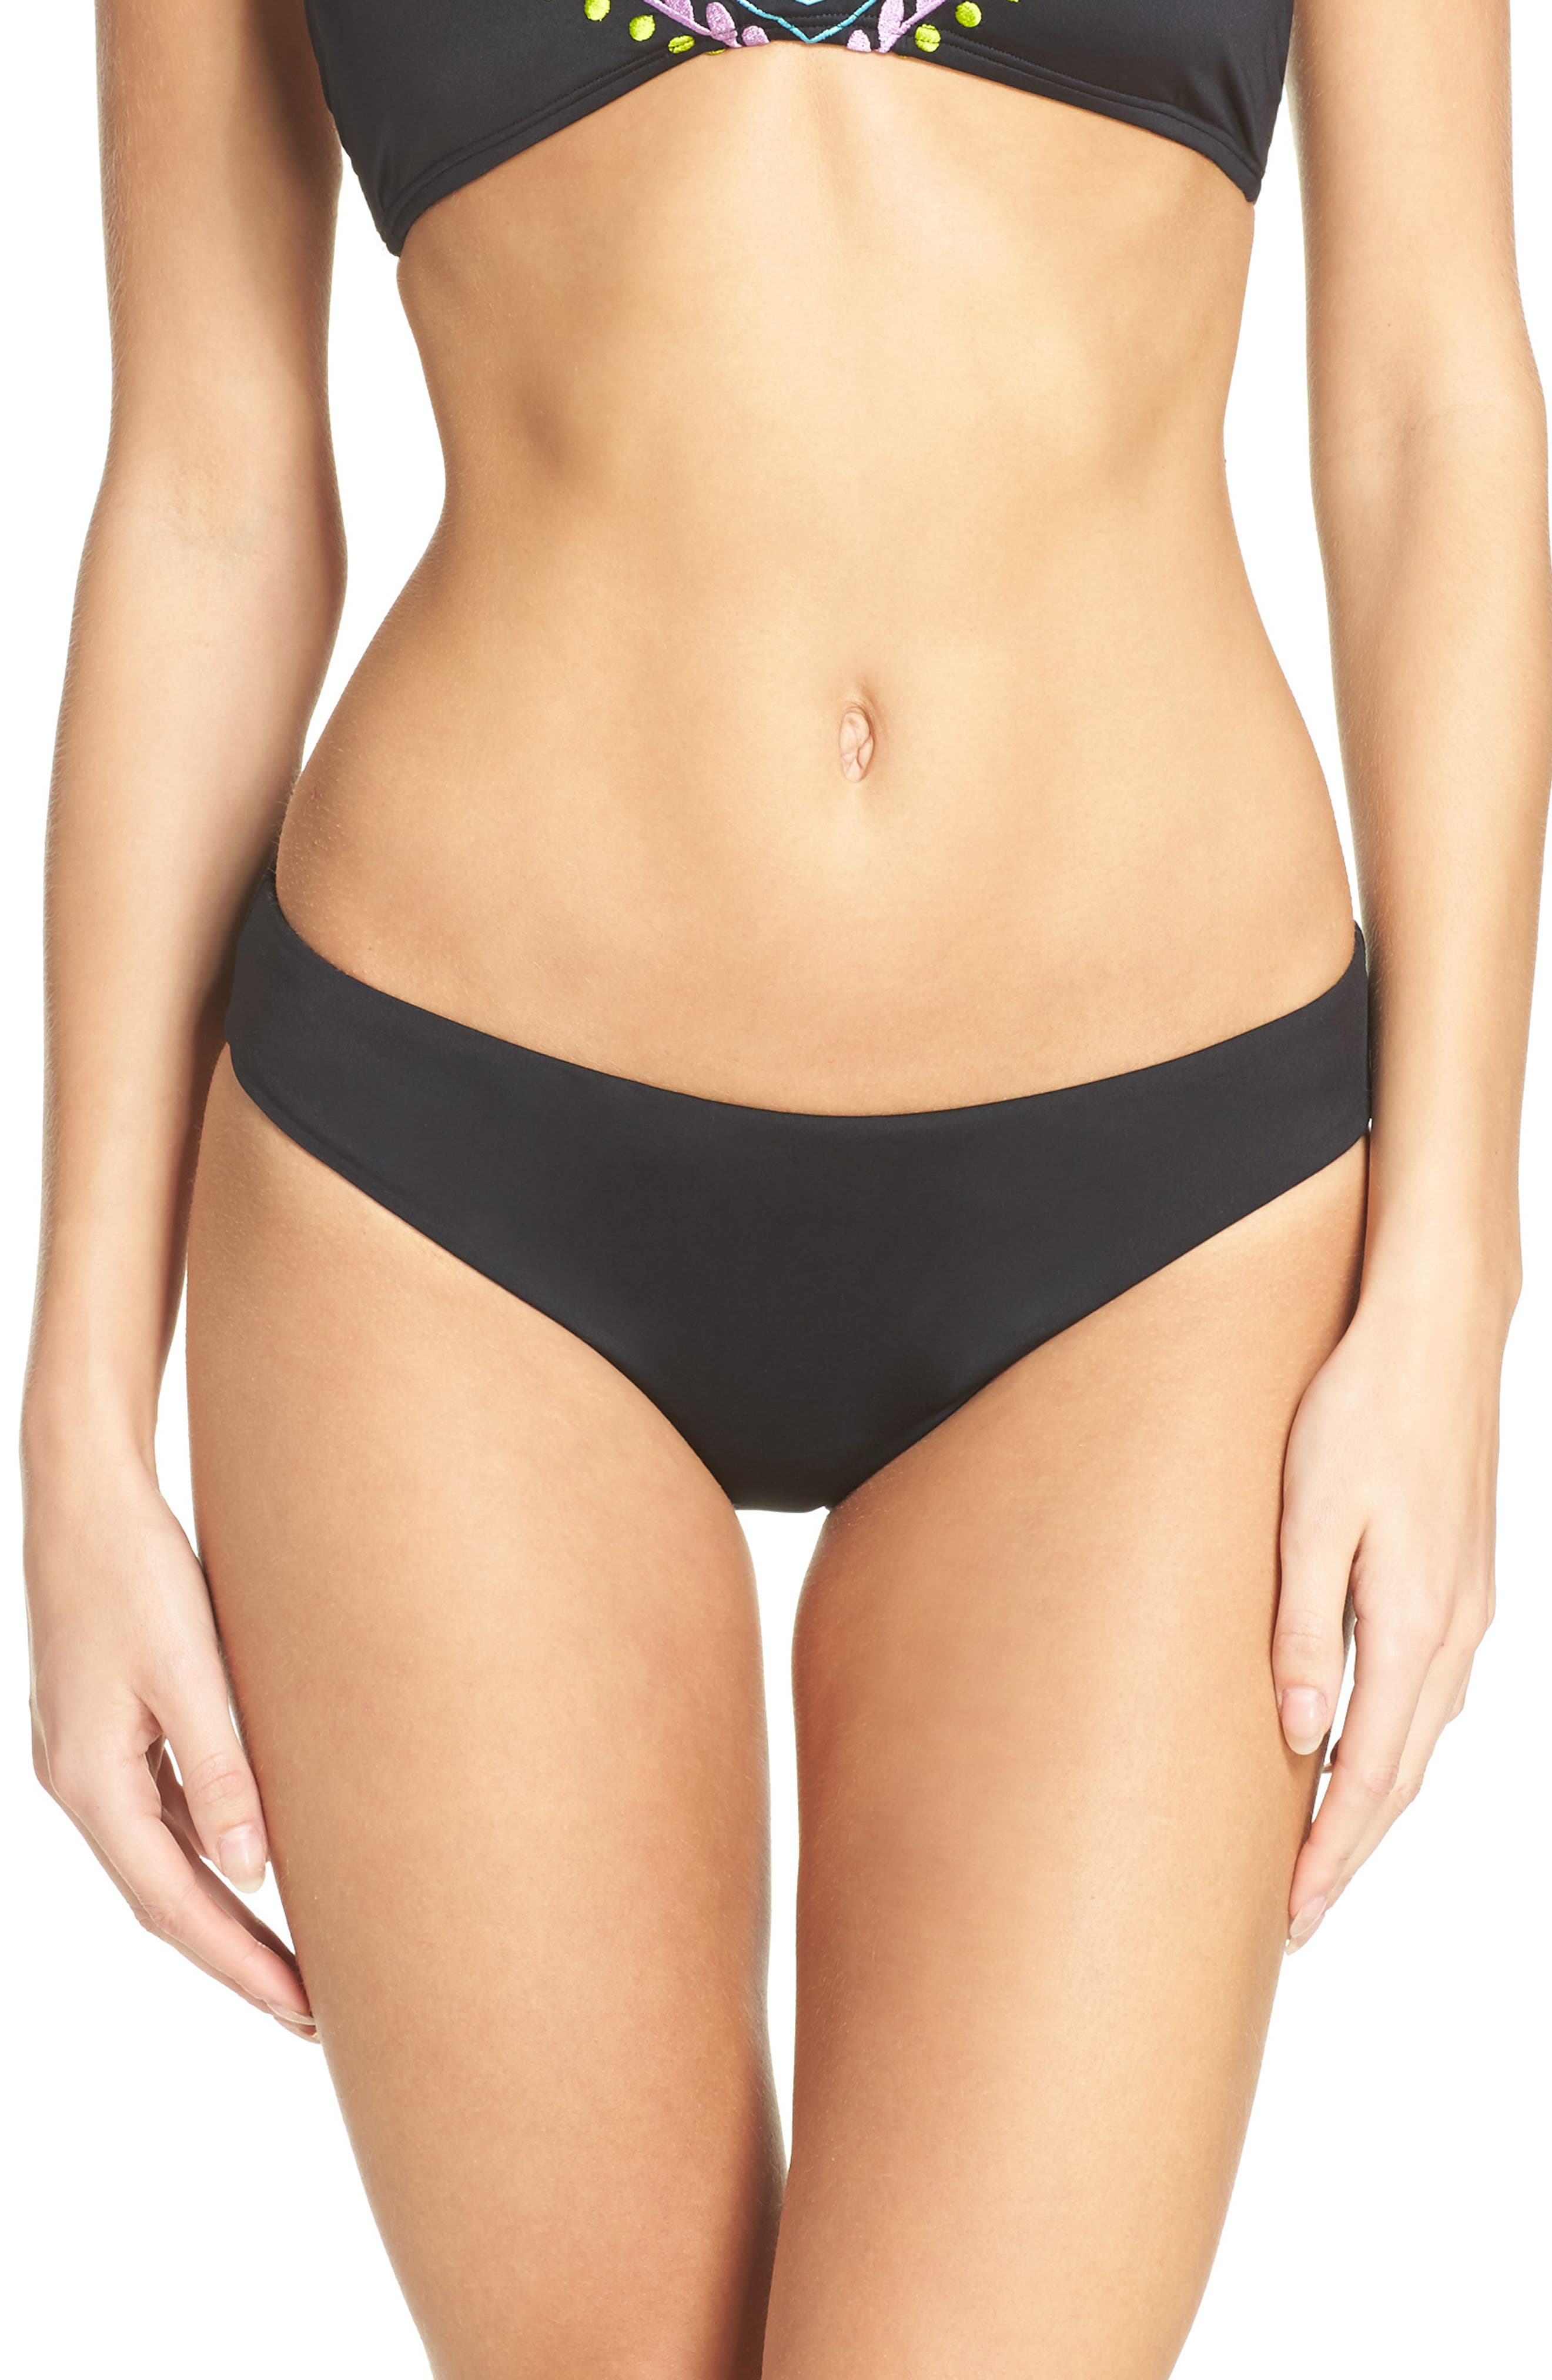 Alternate Image 1 Selected - Laundry by Shelli Segal Hipster Bikini Bottoms